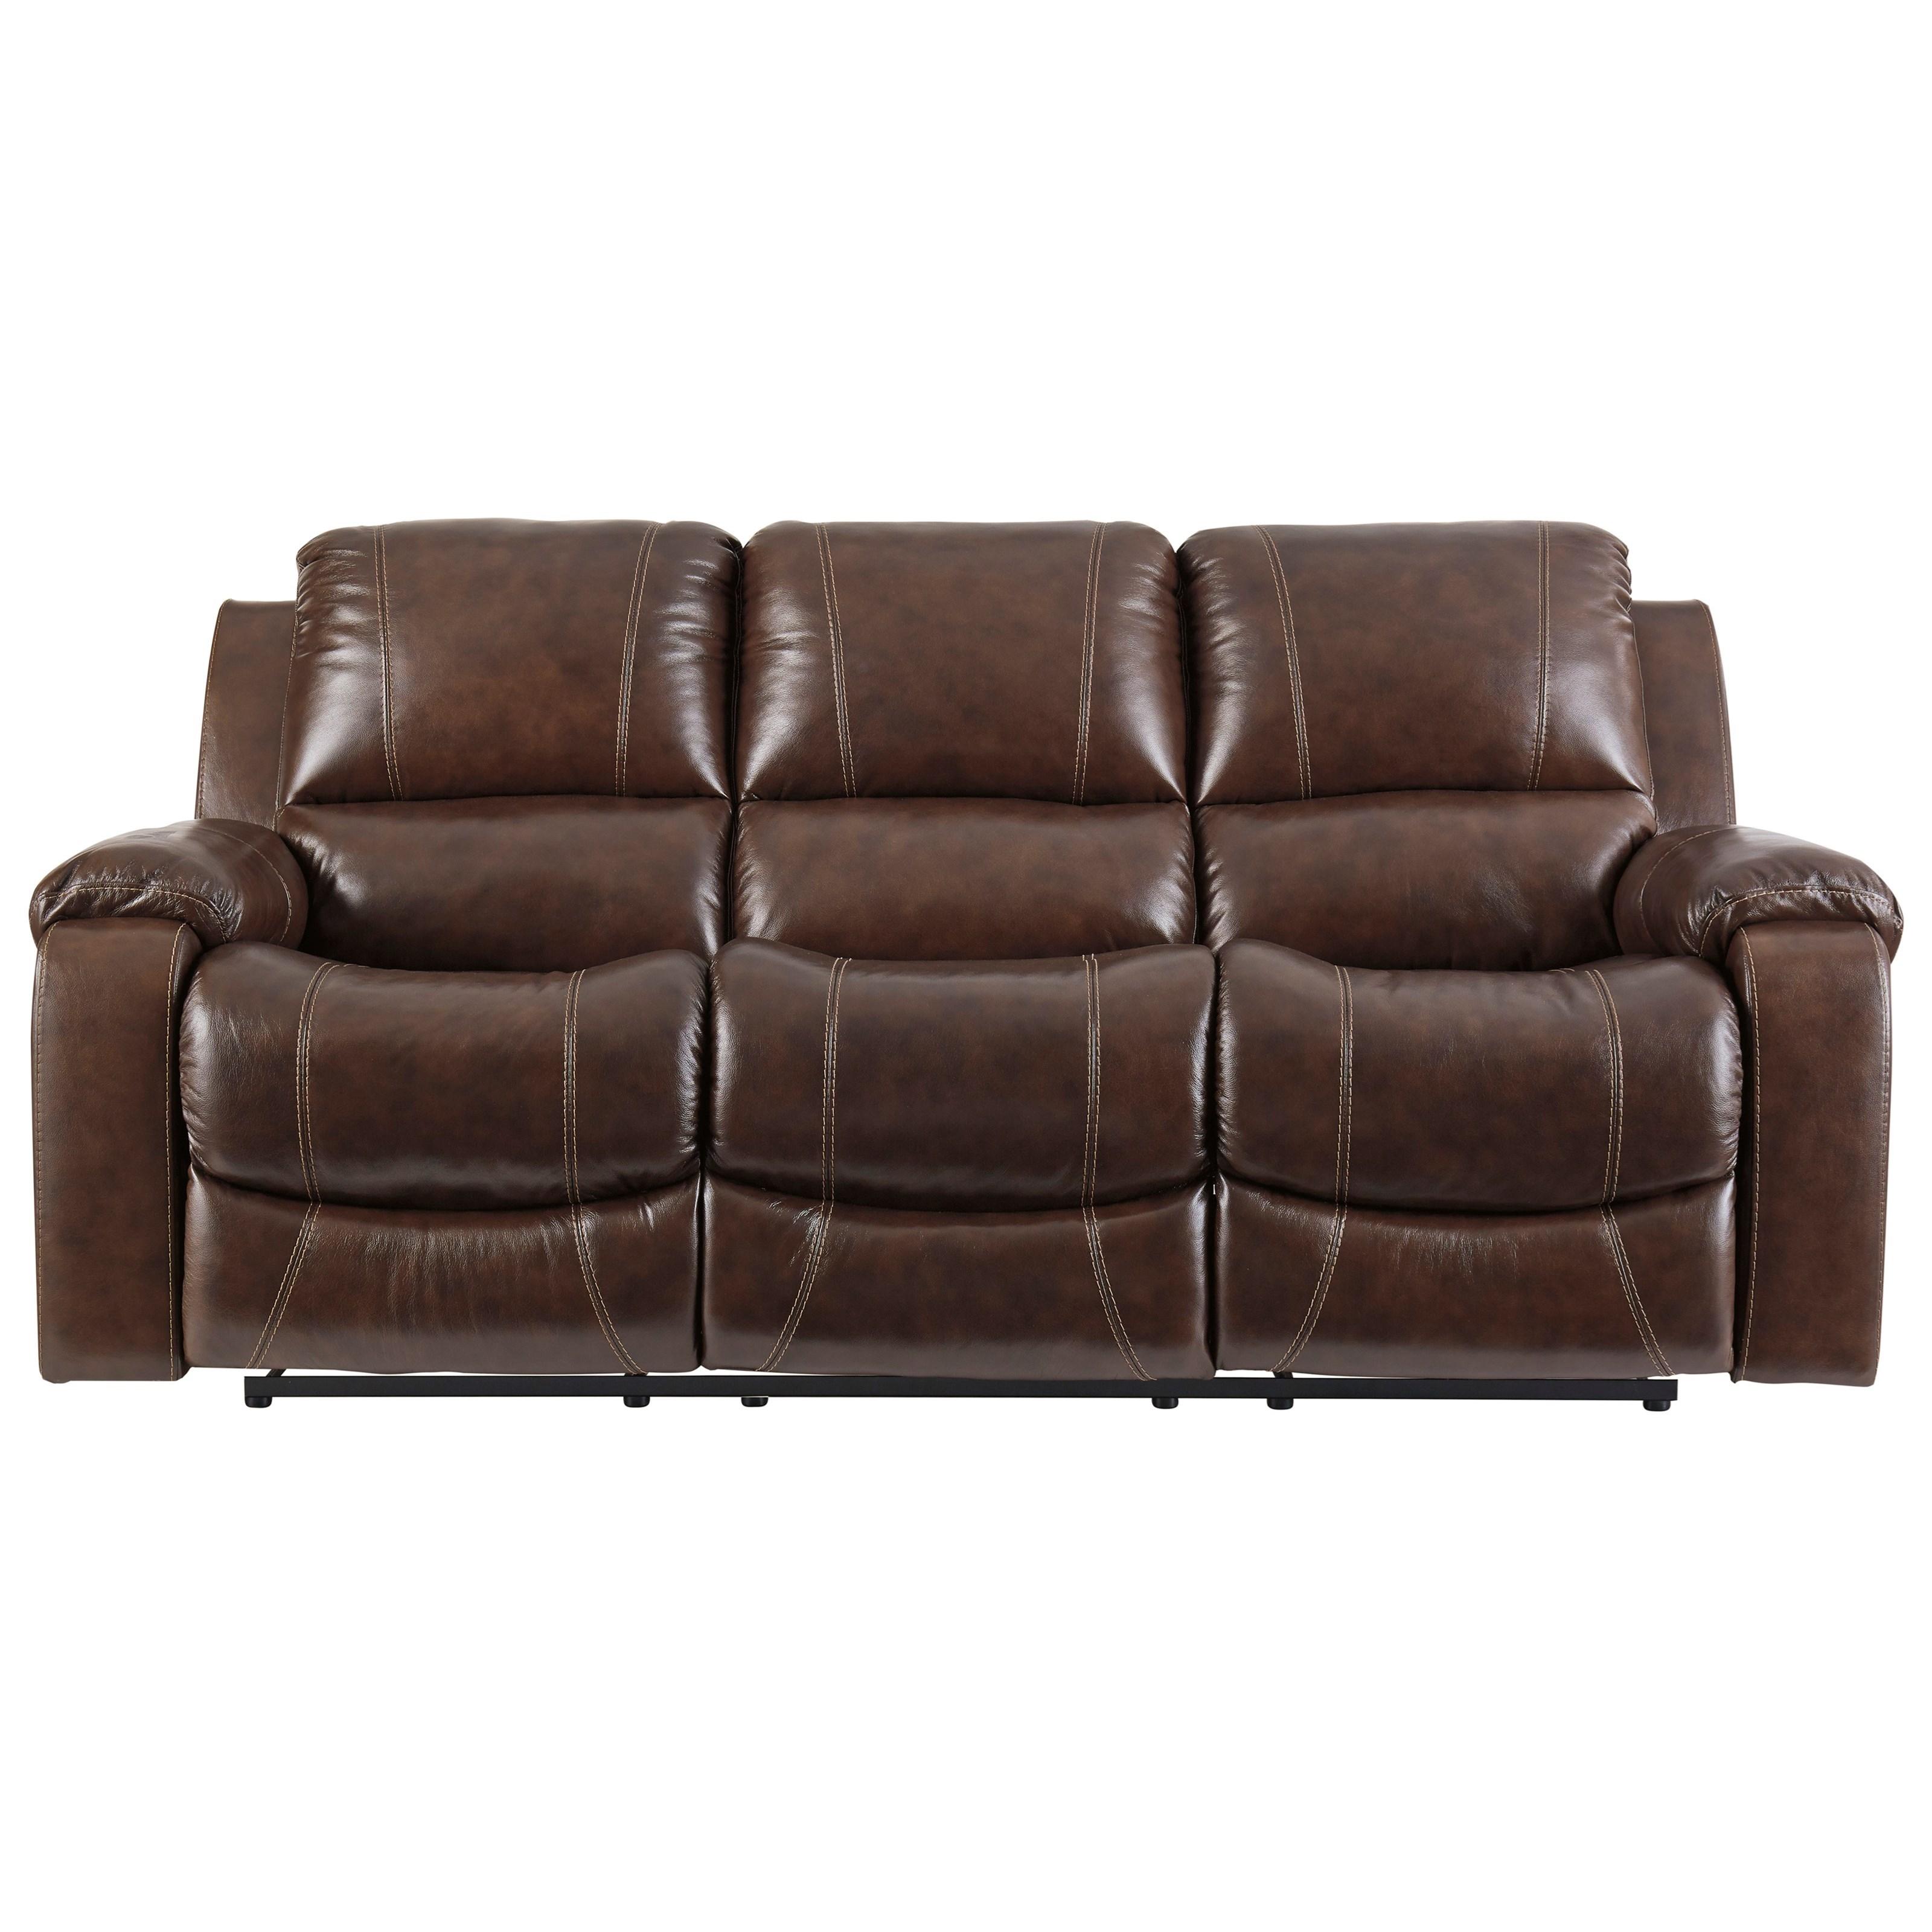 Rainier Reclining Sofa by Signature at Walker's Furniture